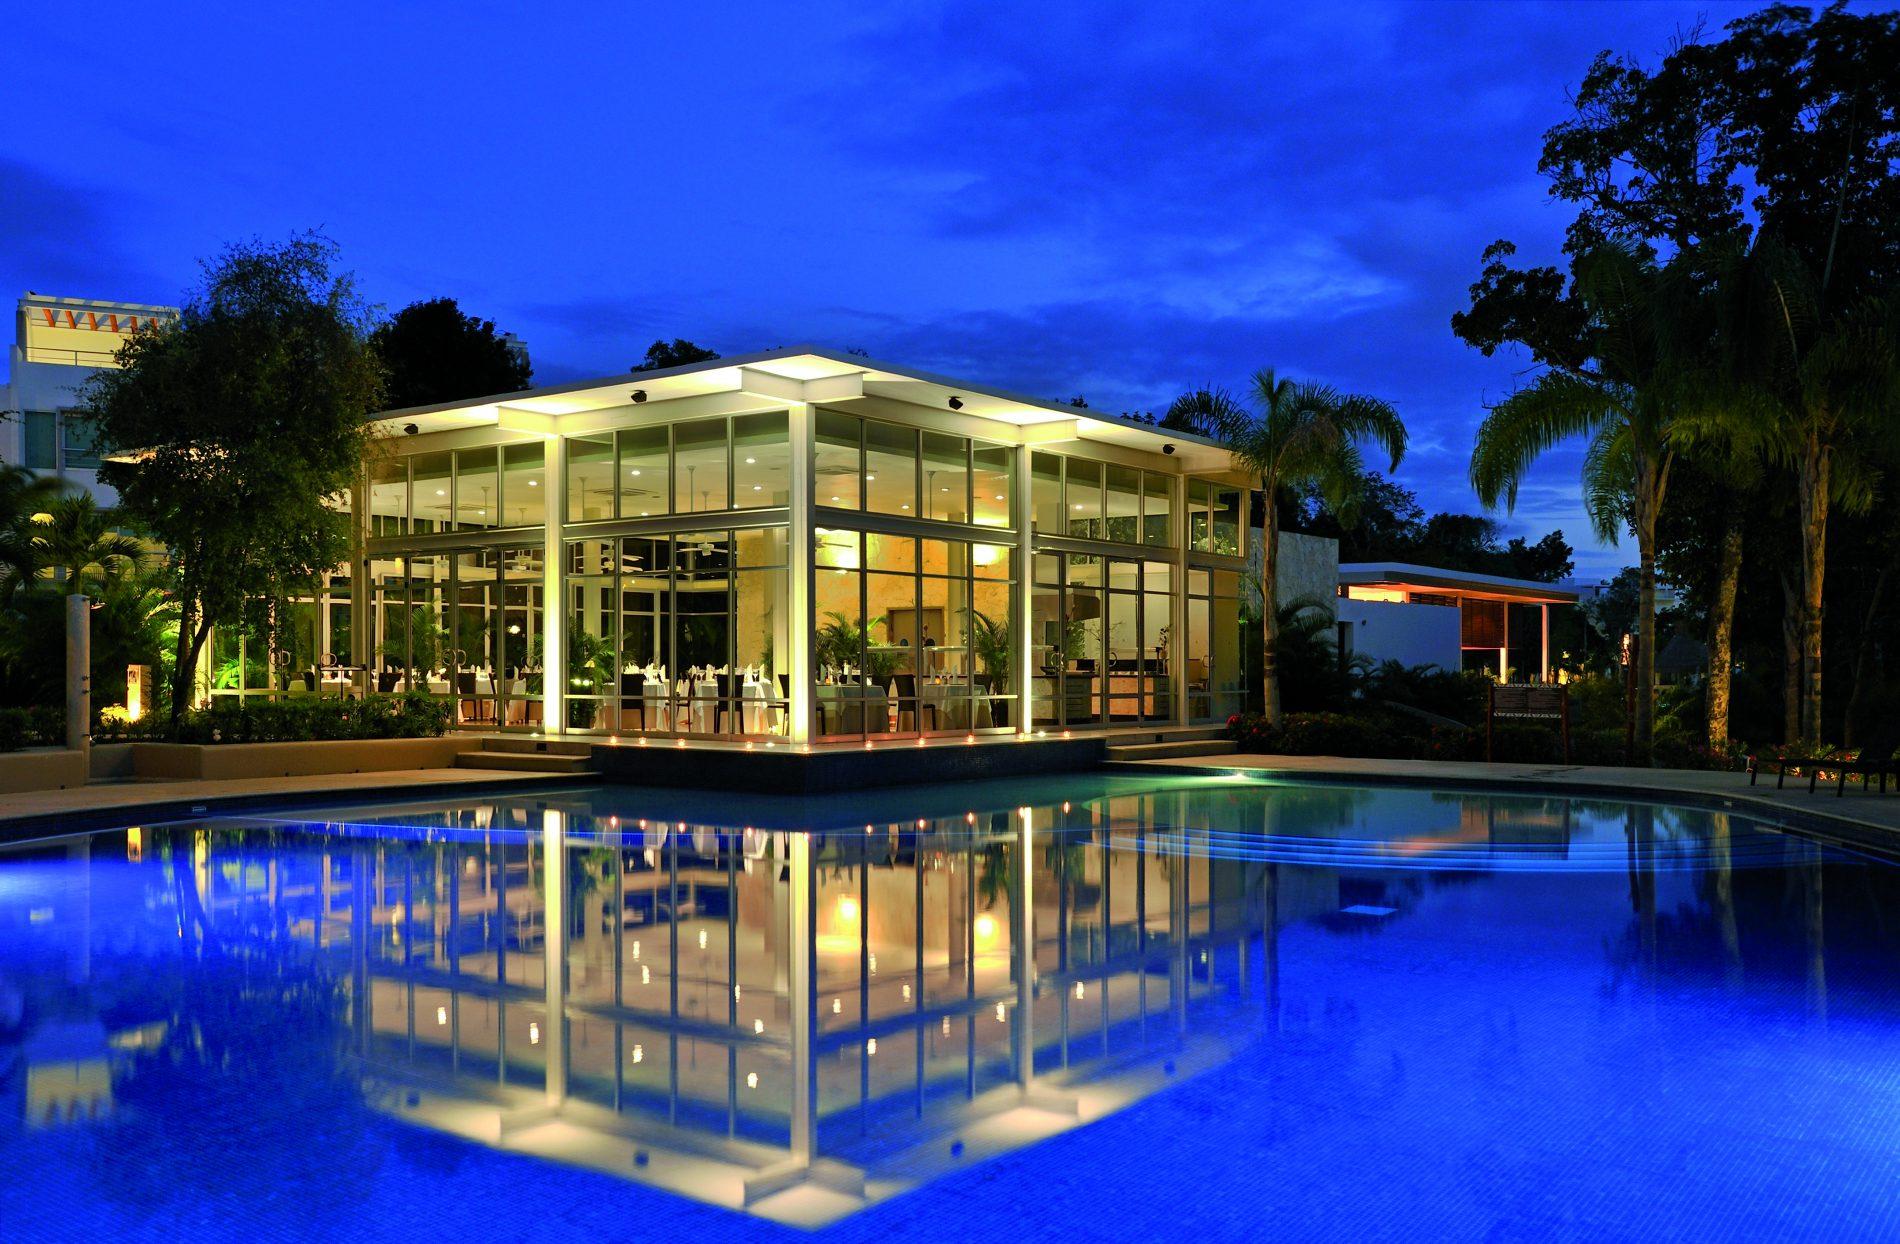 Vista noturna do Sian Ka'an, resort Bahia Principe na Riviera Maya (Bahia Principe/Divulgação)